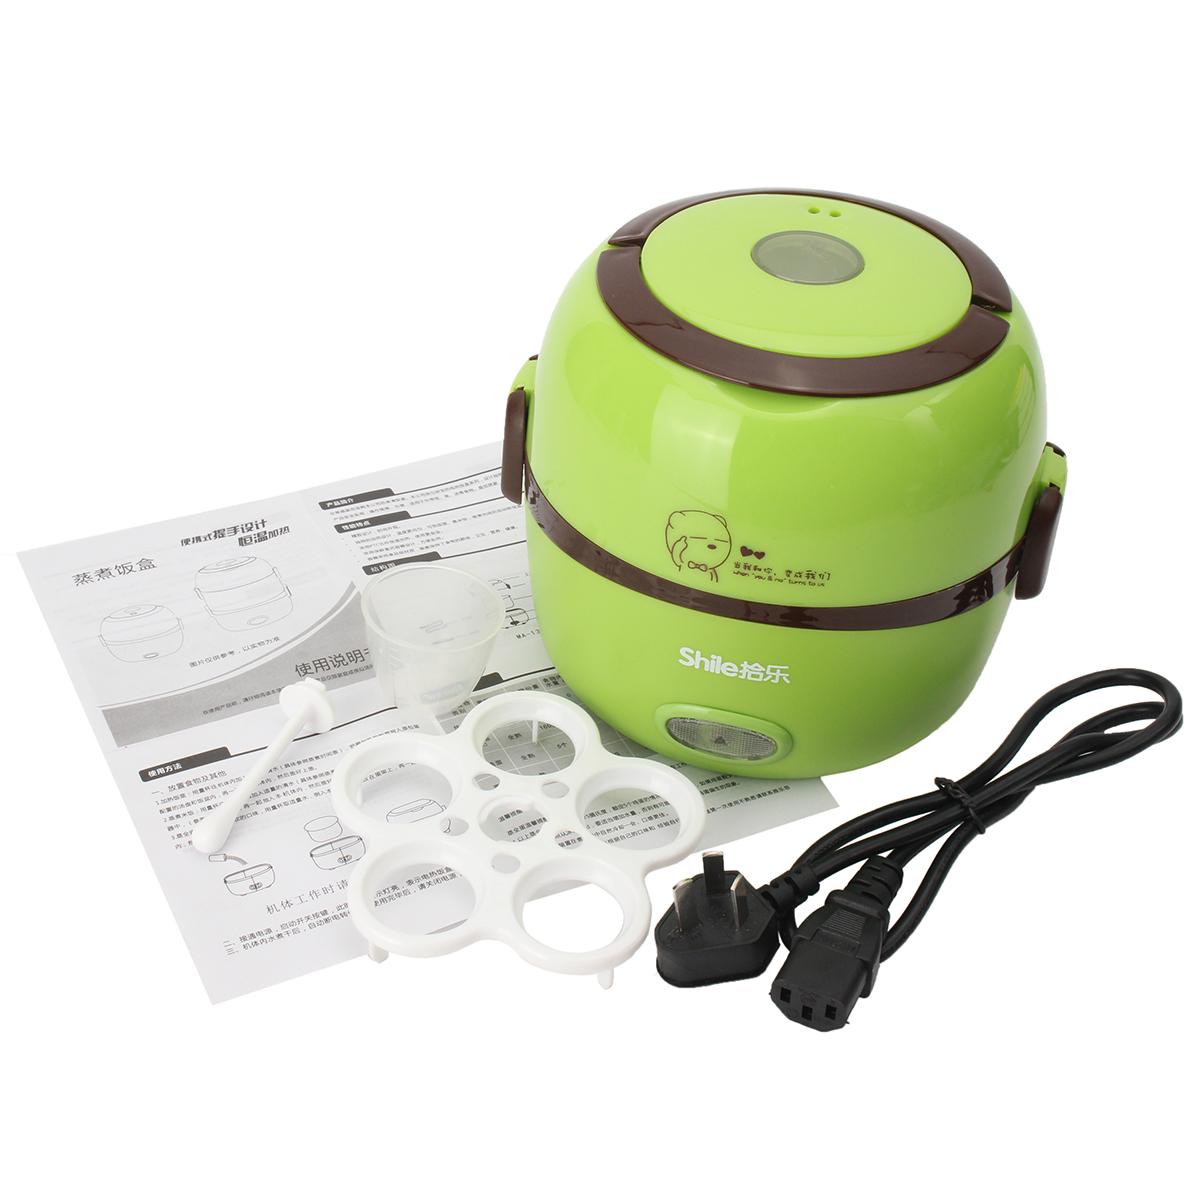 lifepro electric lunch box manual